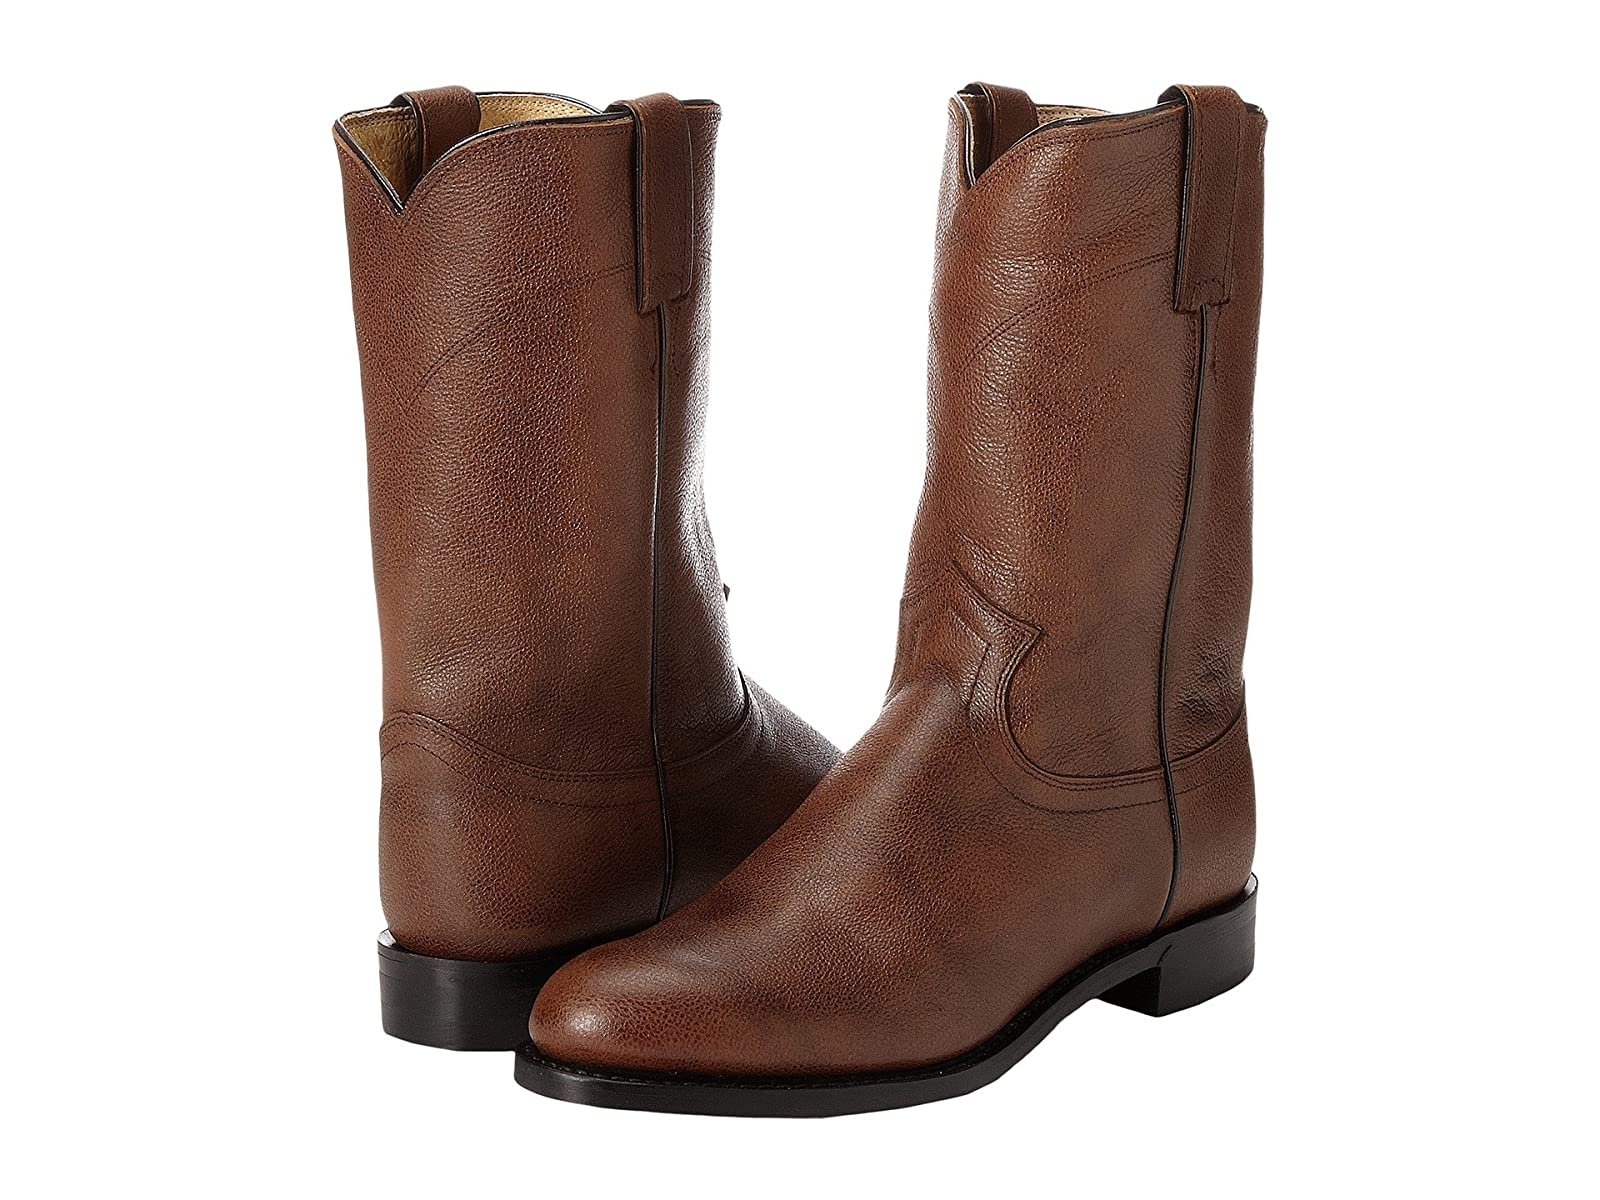 Justin JacksonAffordable and distinctive shoes